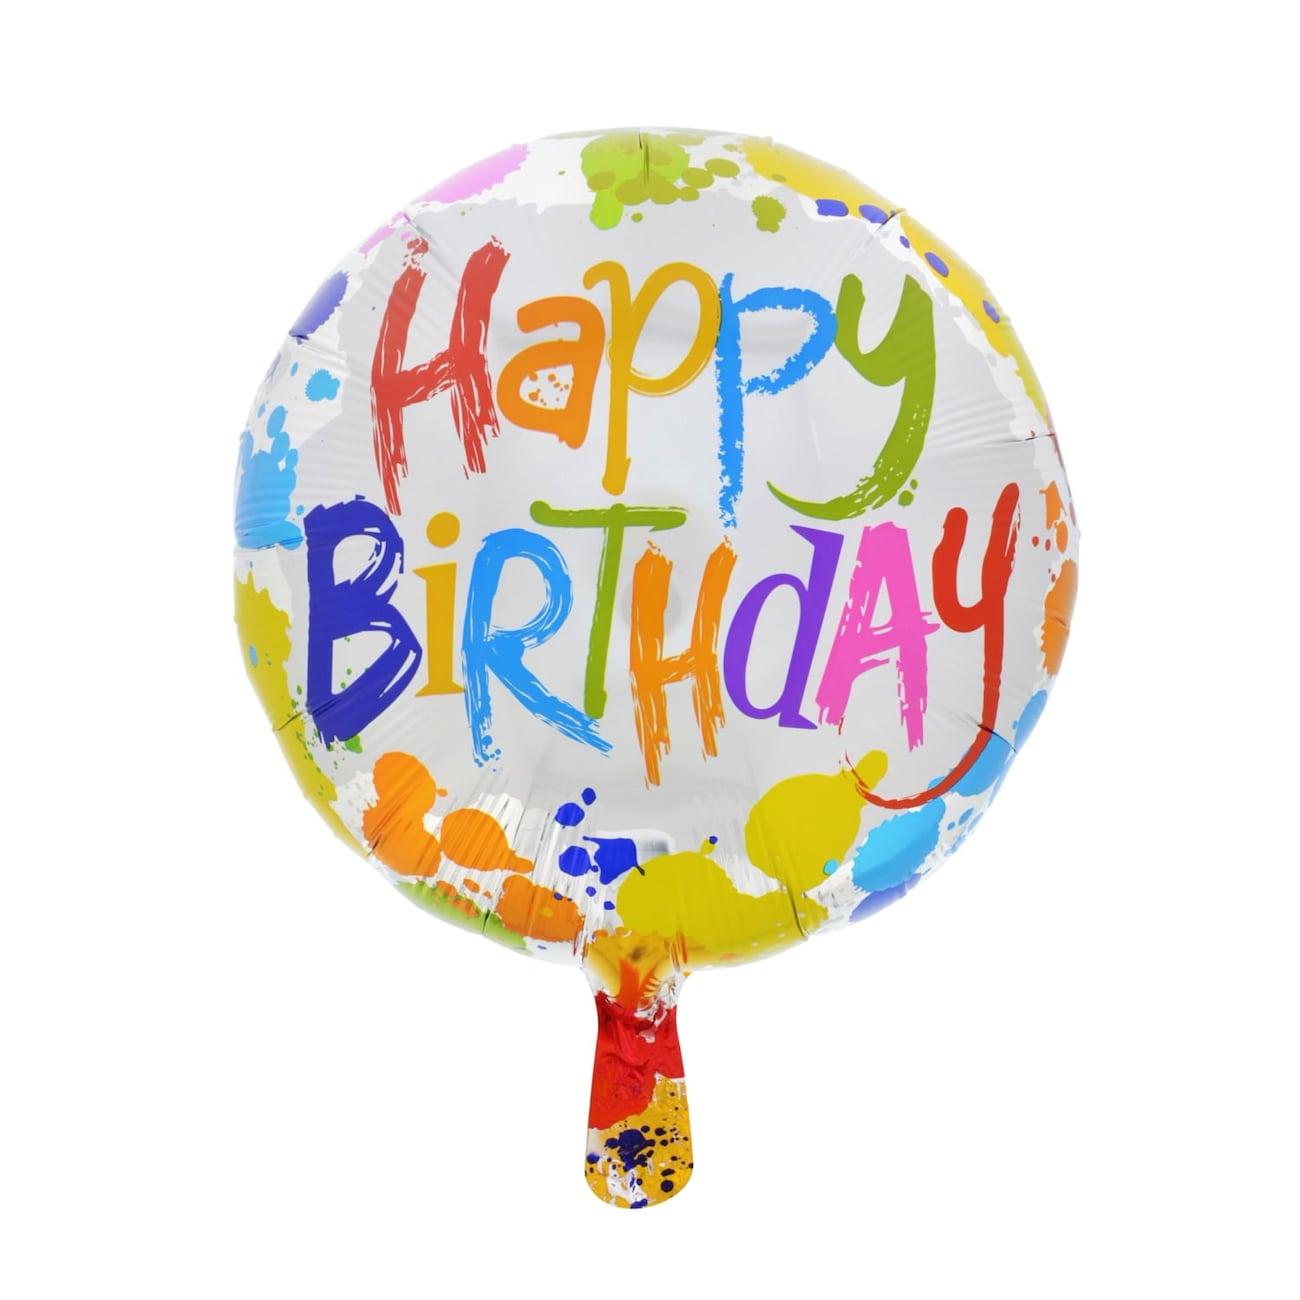 Tie Dye Happy Birthday Foil Balloons 18 In